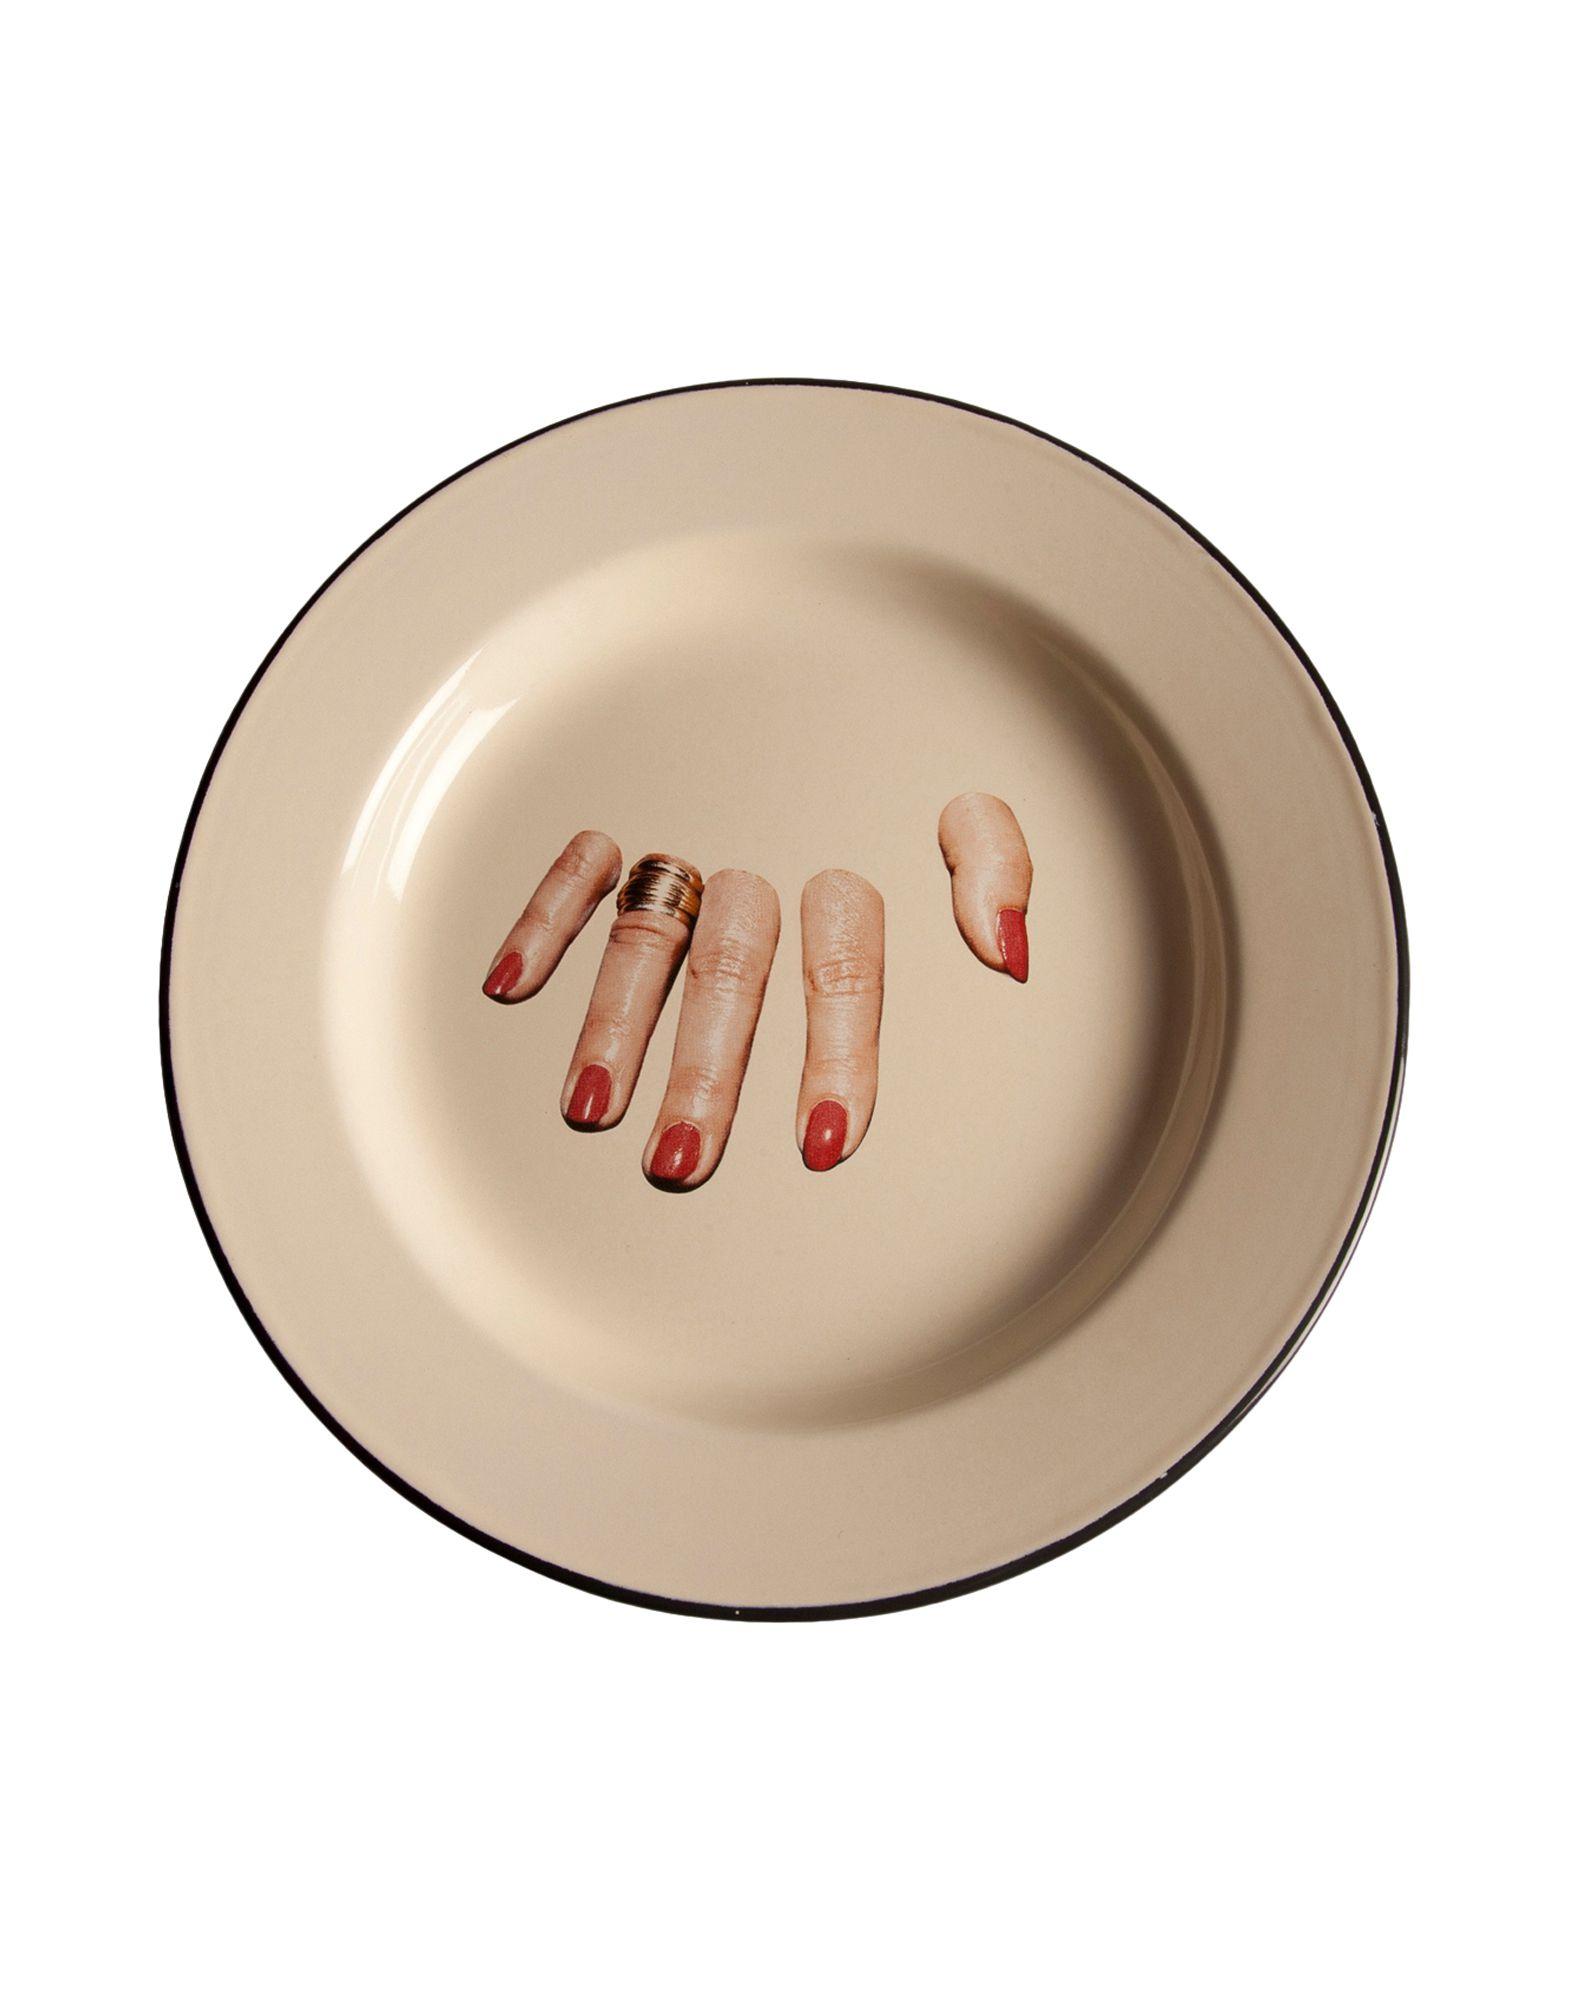 SELETTI WEARS TOILETPAPER Блюдо seletti wears toiletpaper декоративная тарелка